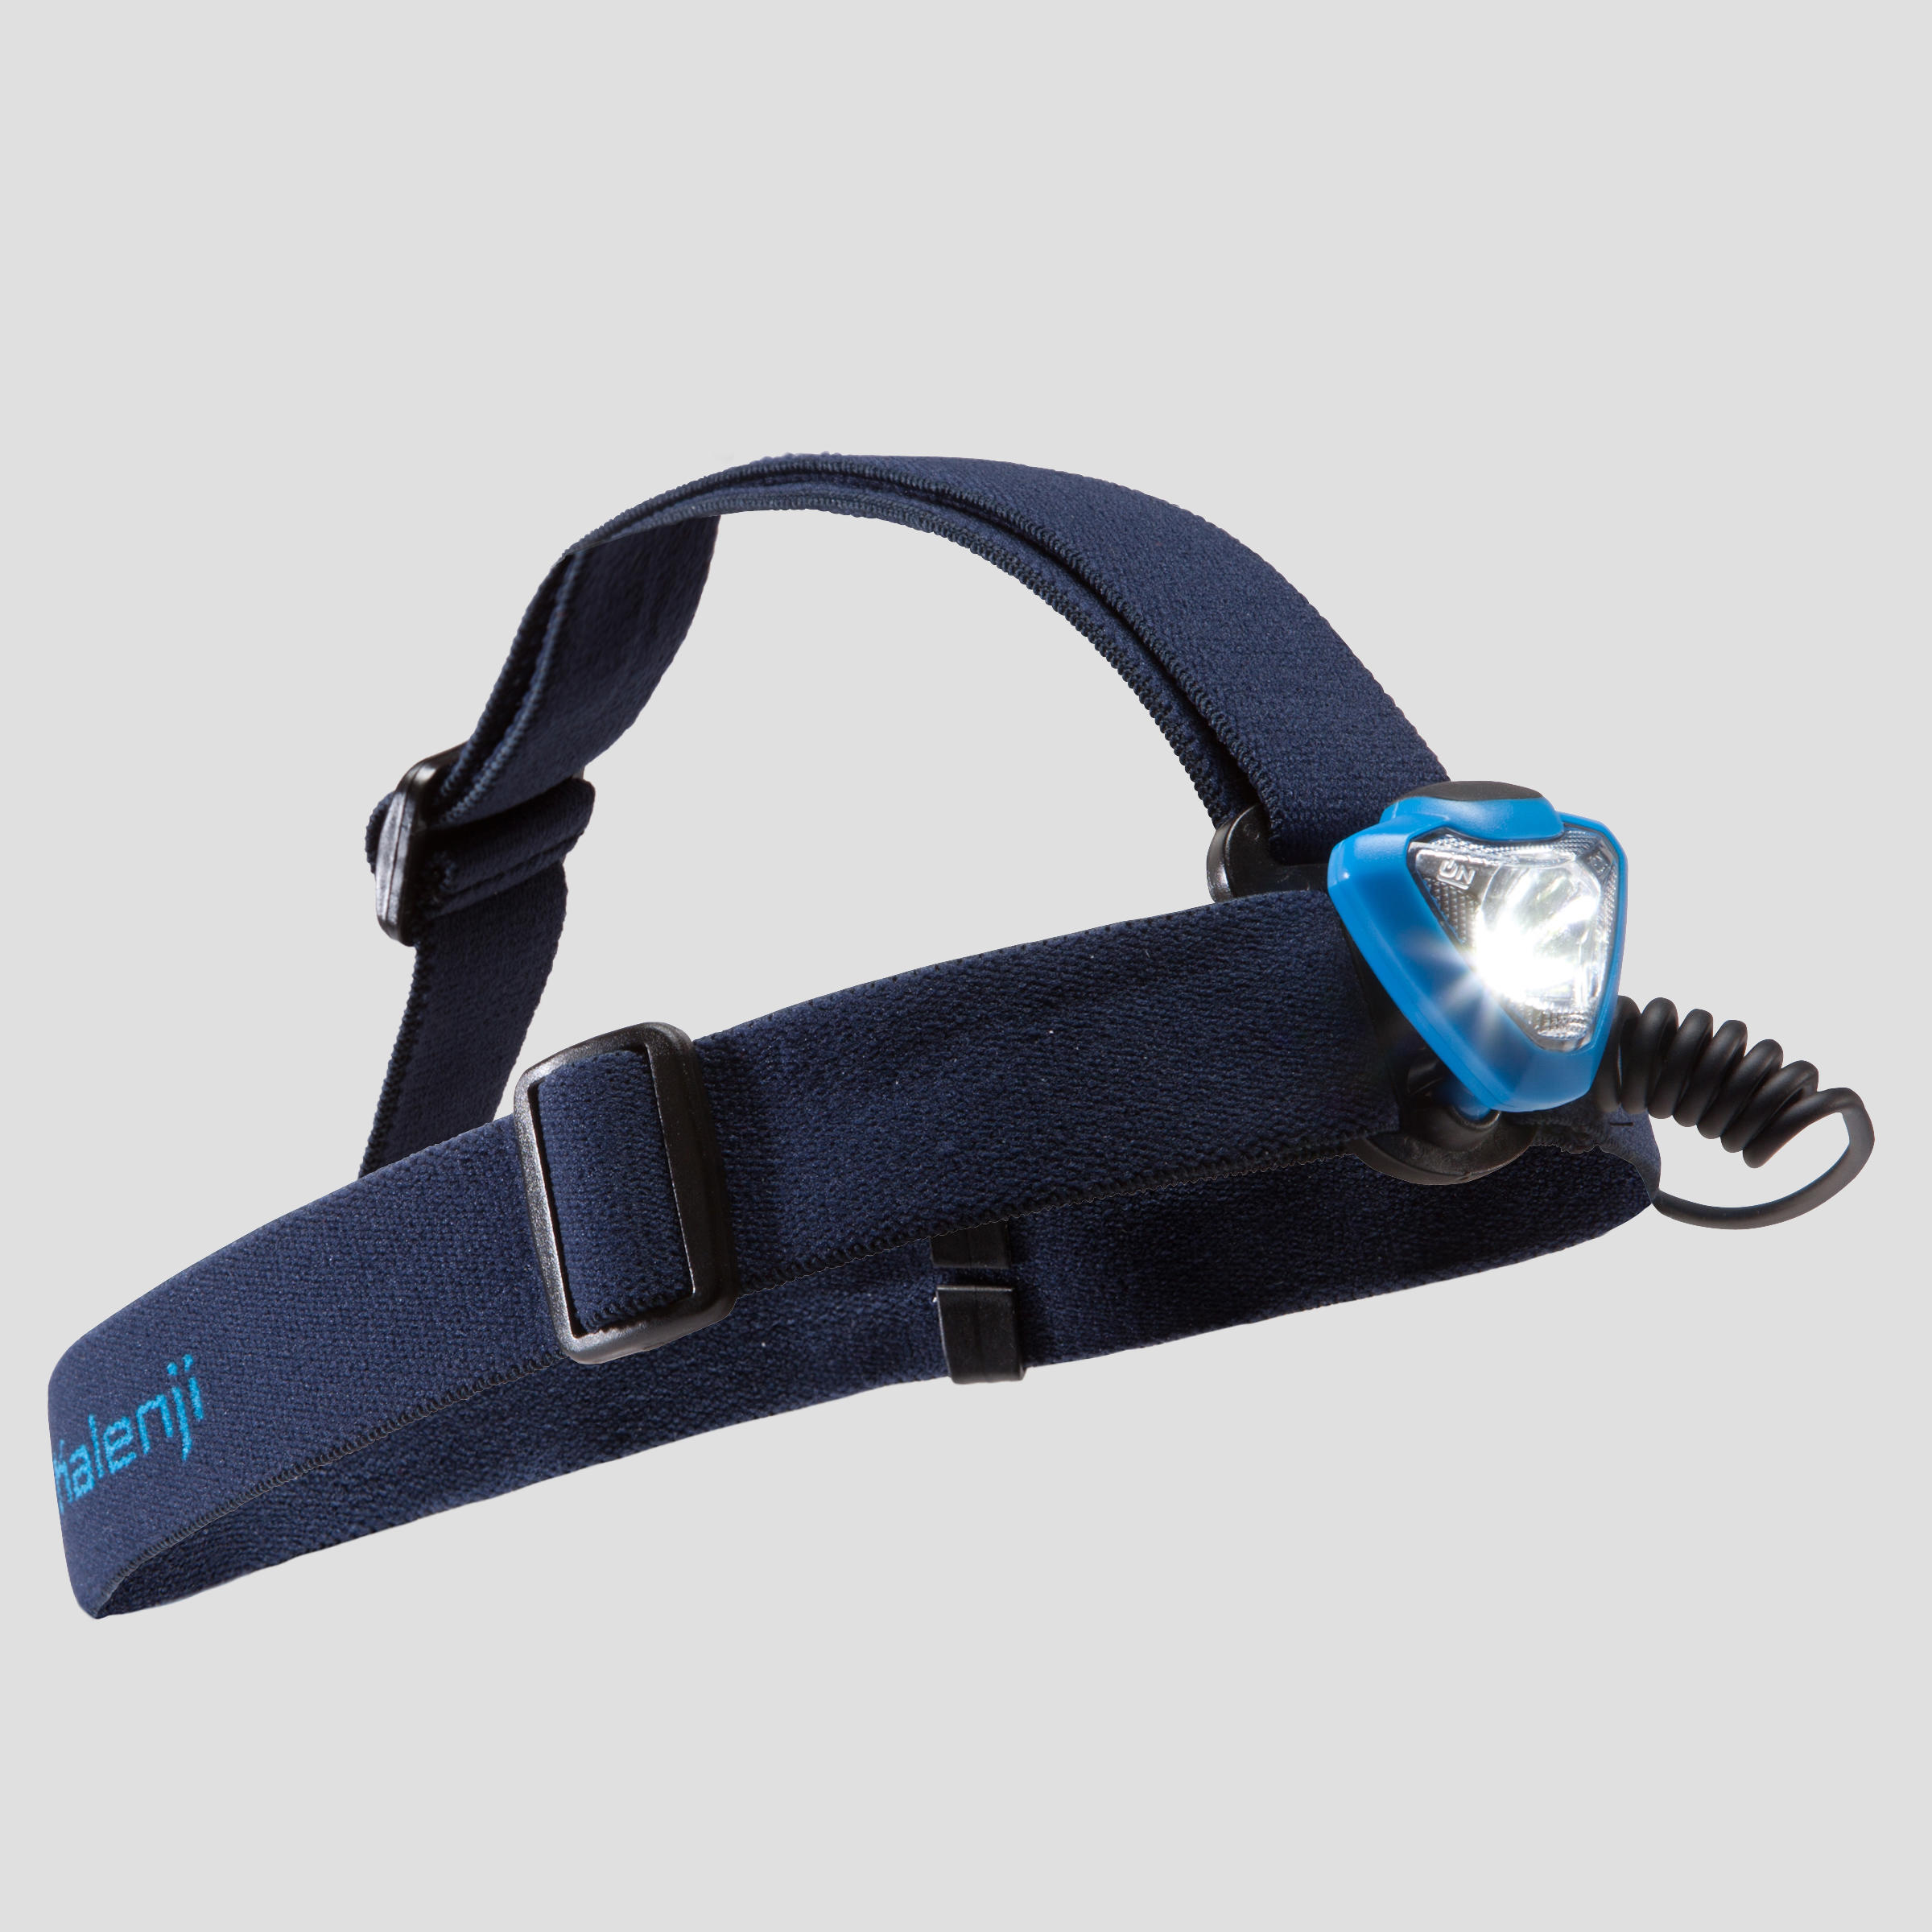 OnNight 210 Trail Running Headlamp 100 Lumens - Blue